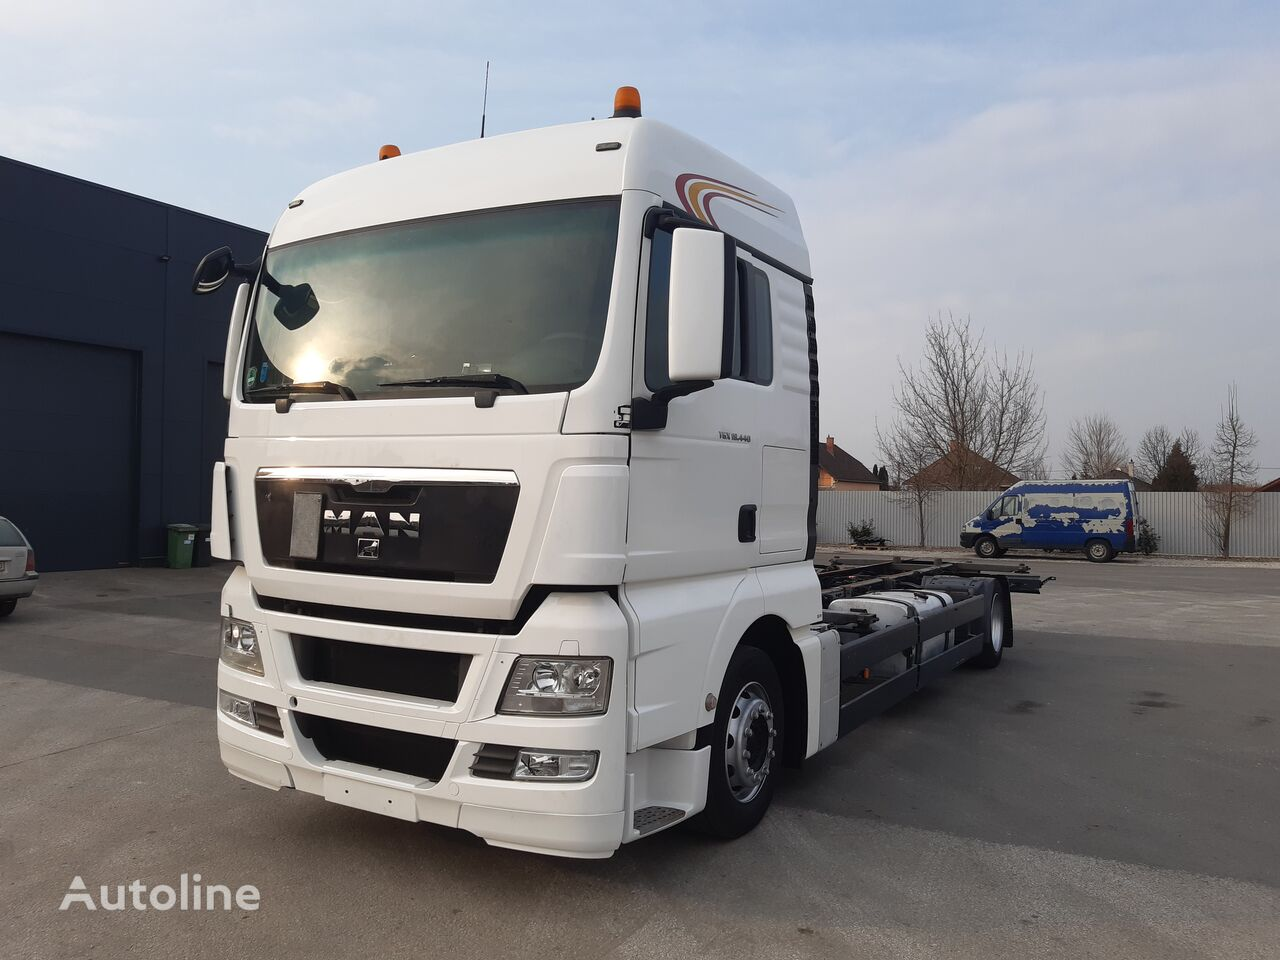 MAN TGX 18.440LL JUMBO BDF KÉZI VÁLTÓ chassis truck